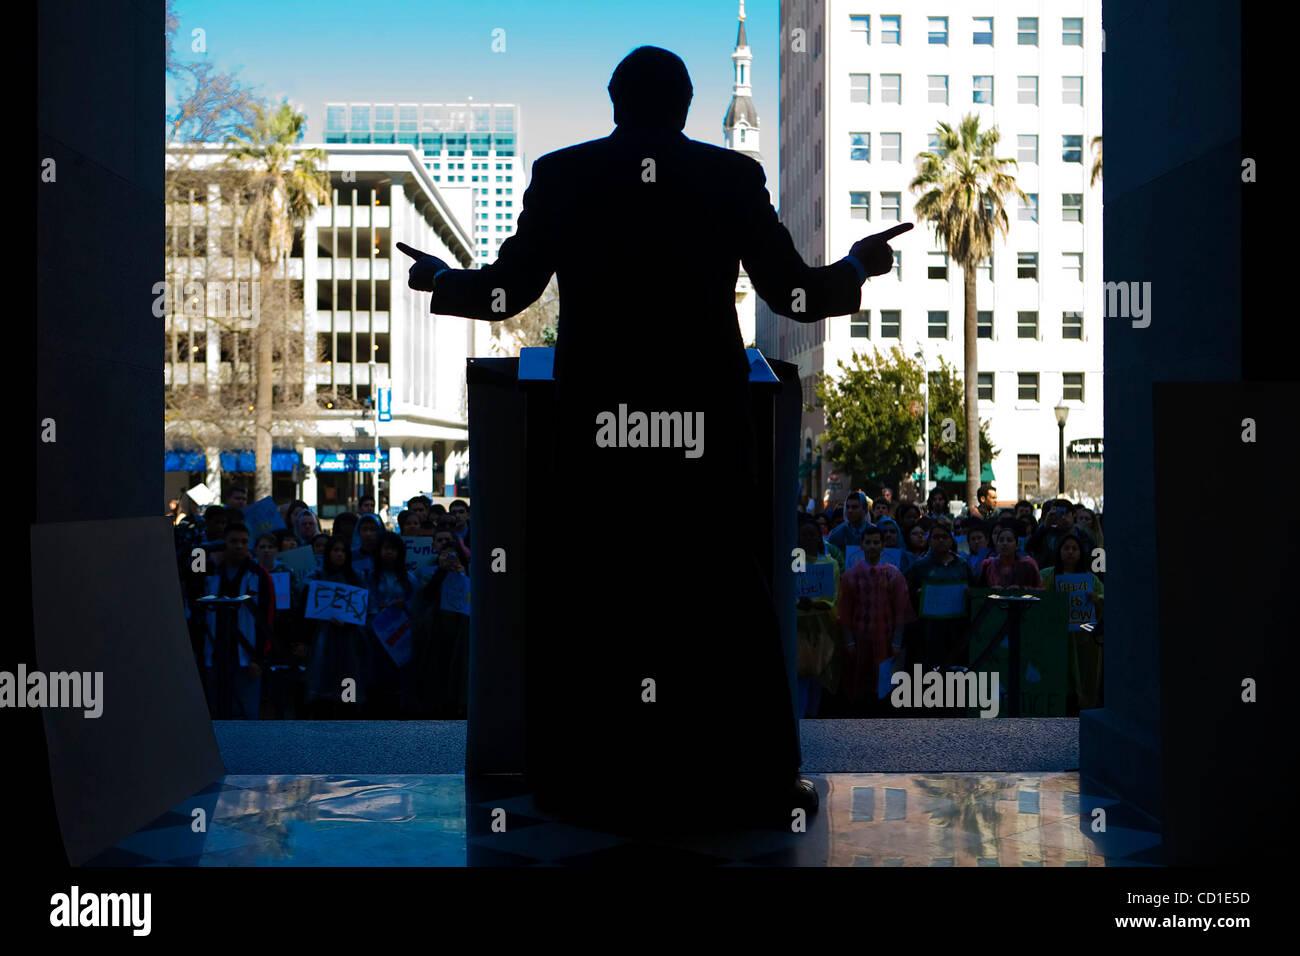 Lt. Gov. John Garamendi, addresses University of California students during their annual lobbying day at the State - Stock Image